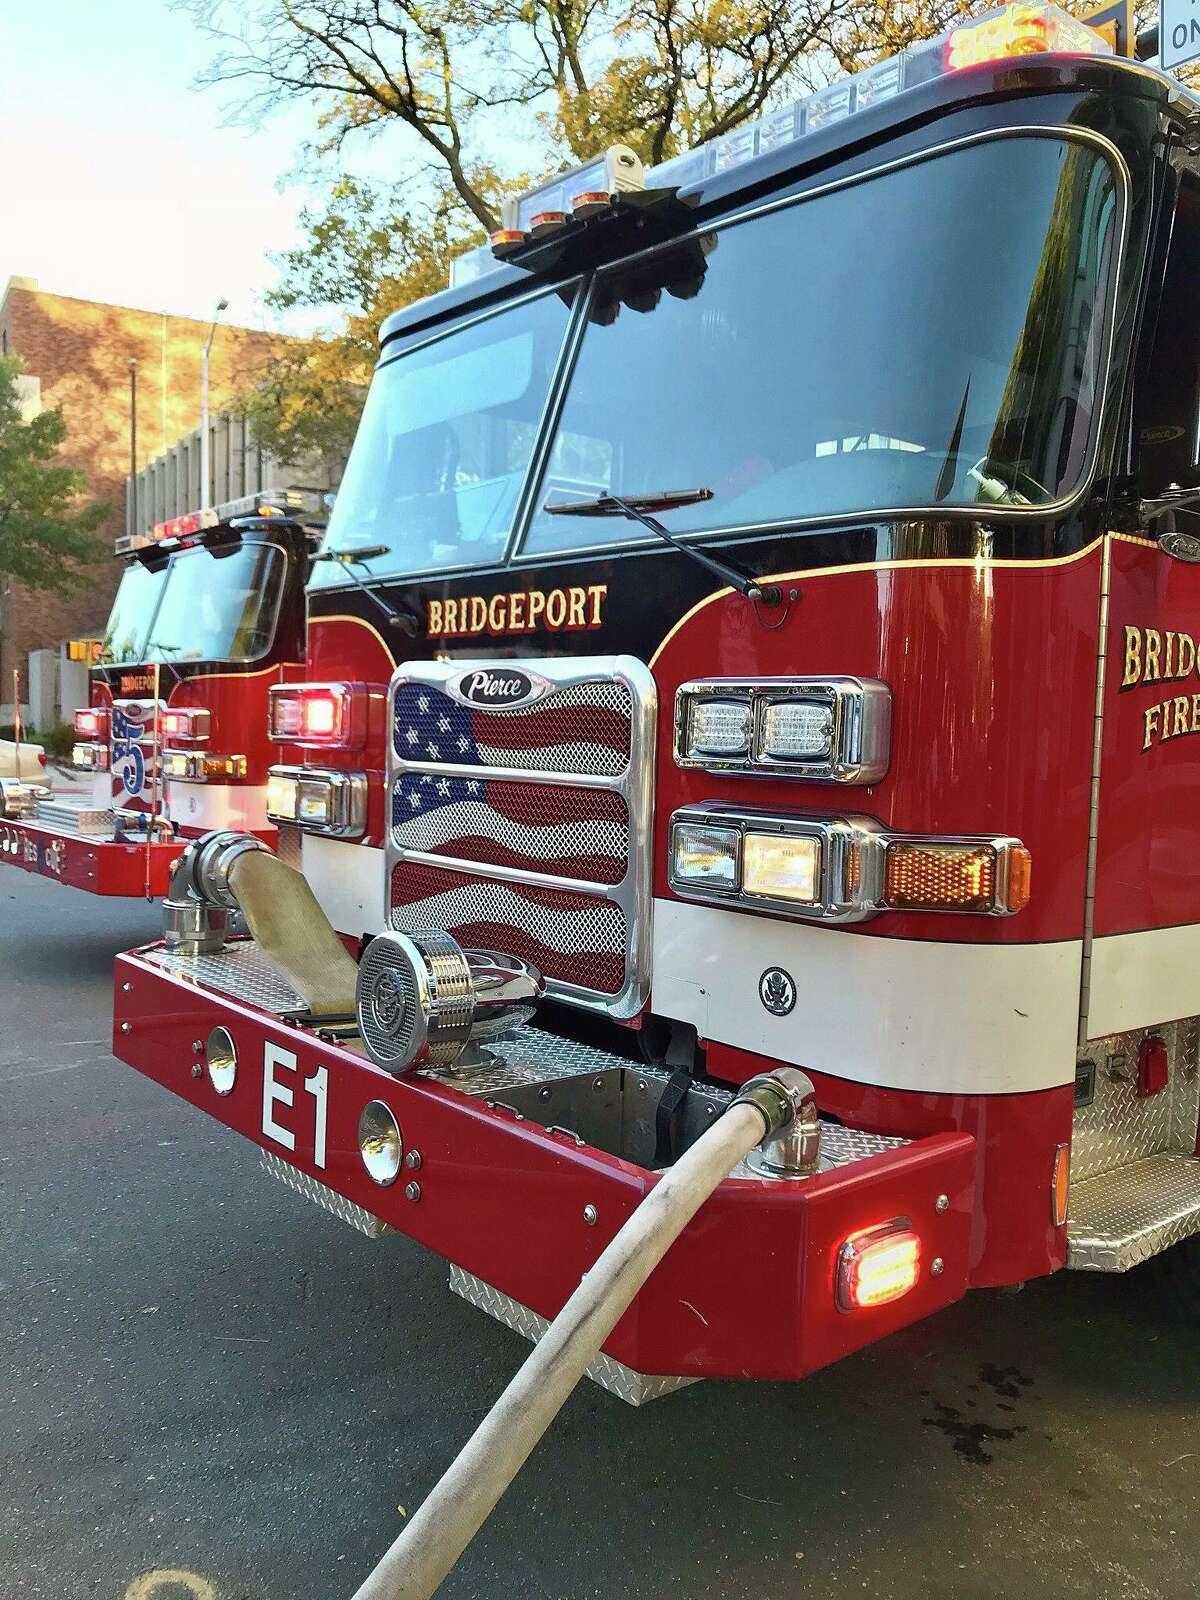 A file photo of a Bridgeport, Conn., fire engine.